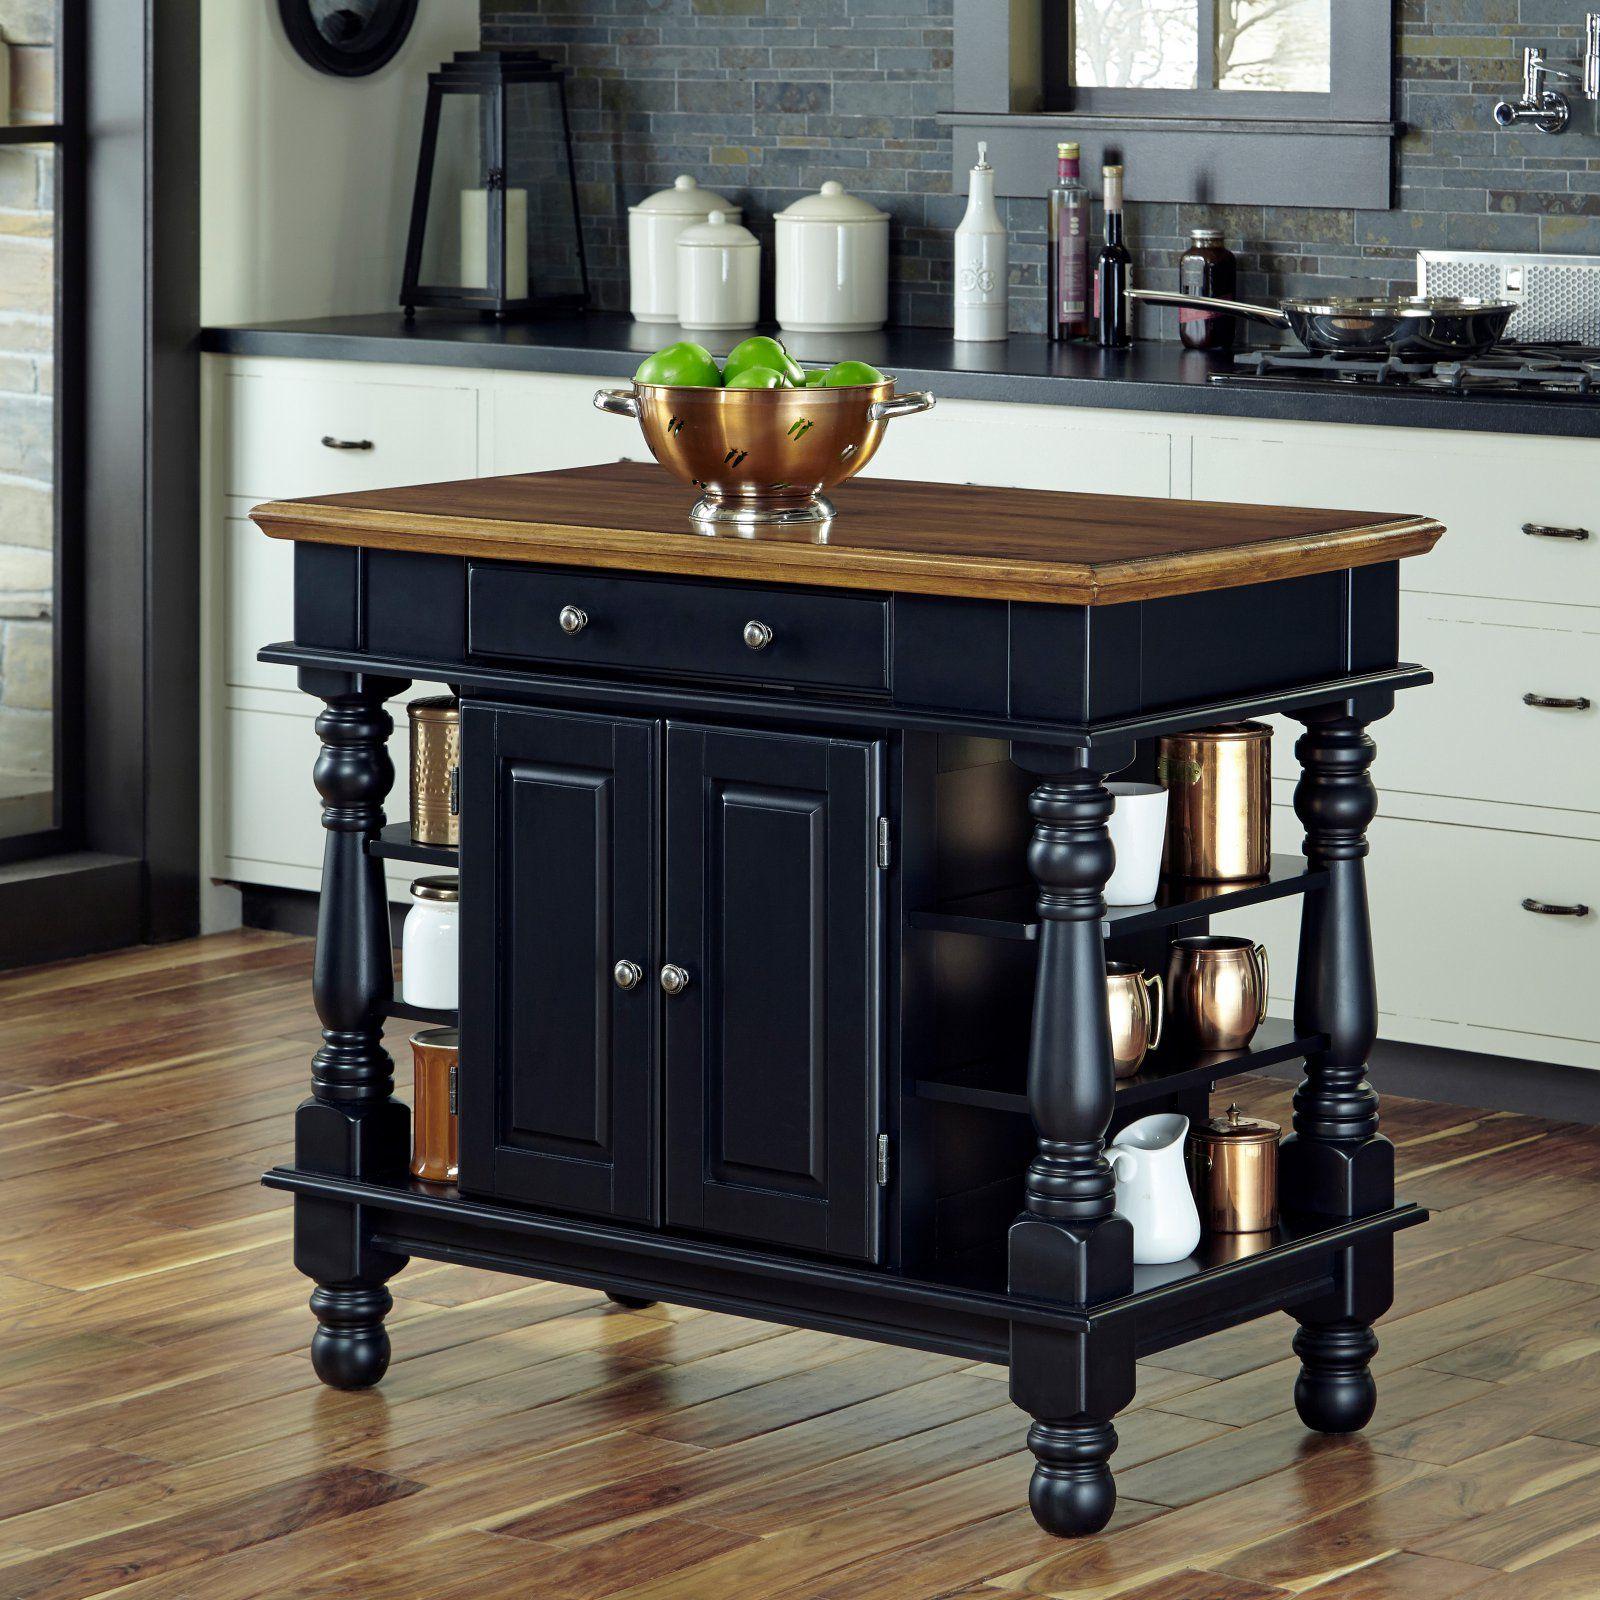 Home Styles Americana Black Kitchen Island In 2020 Black Kitchen Island Americana Kitchen Black Kitchens